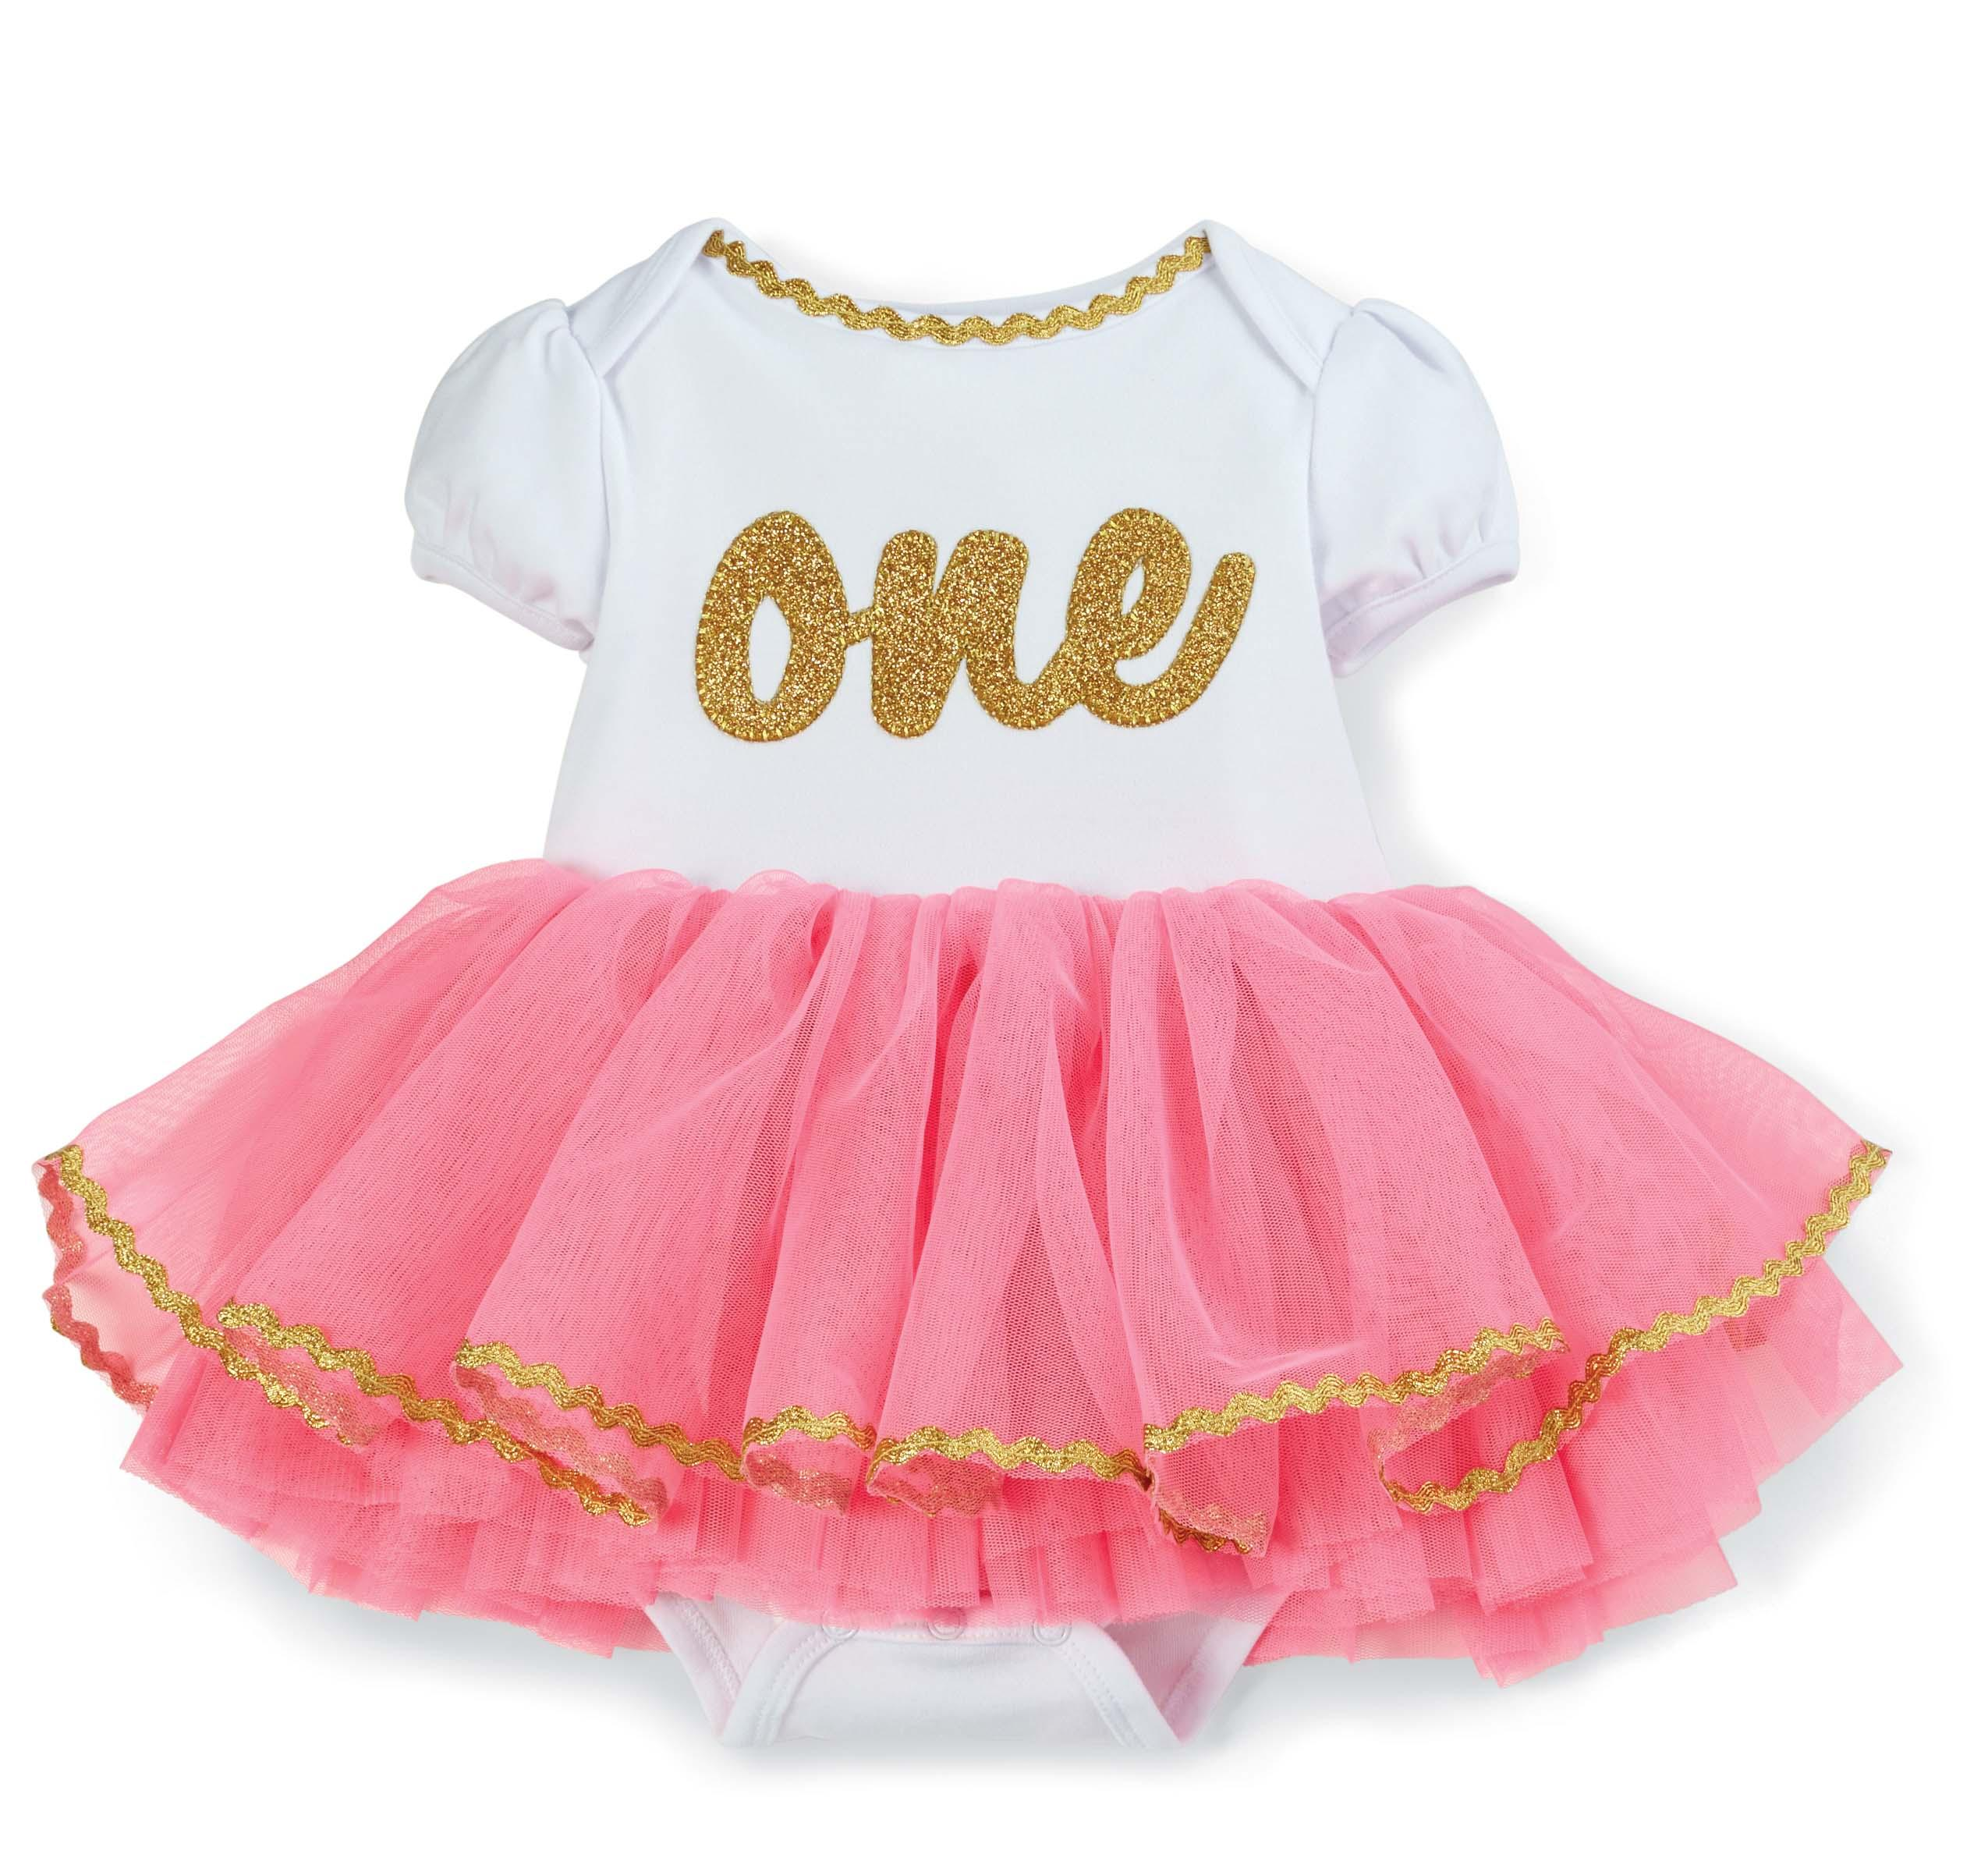 4cb84a755 Amazon.com: Mud Pie Baby Girl's Birthday Tutu, Multi, One Size: Clothing